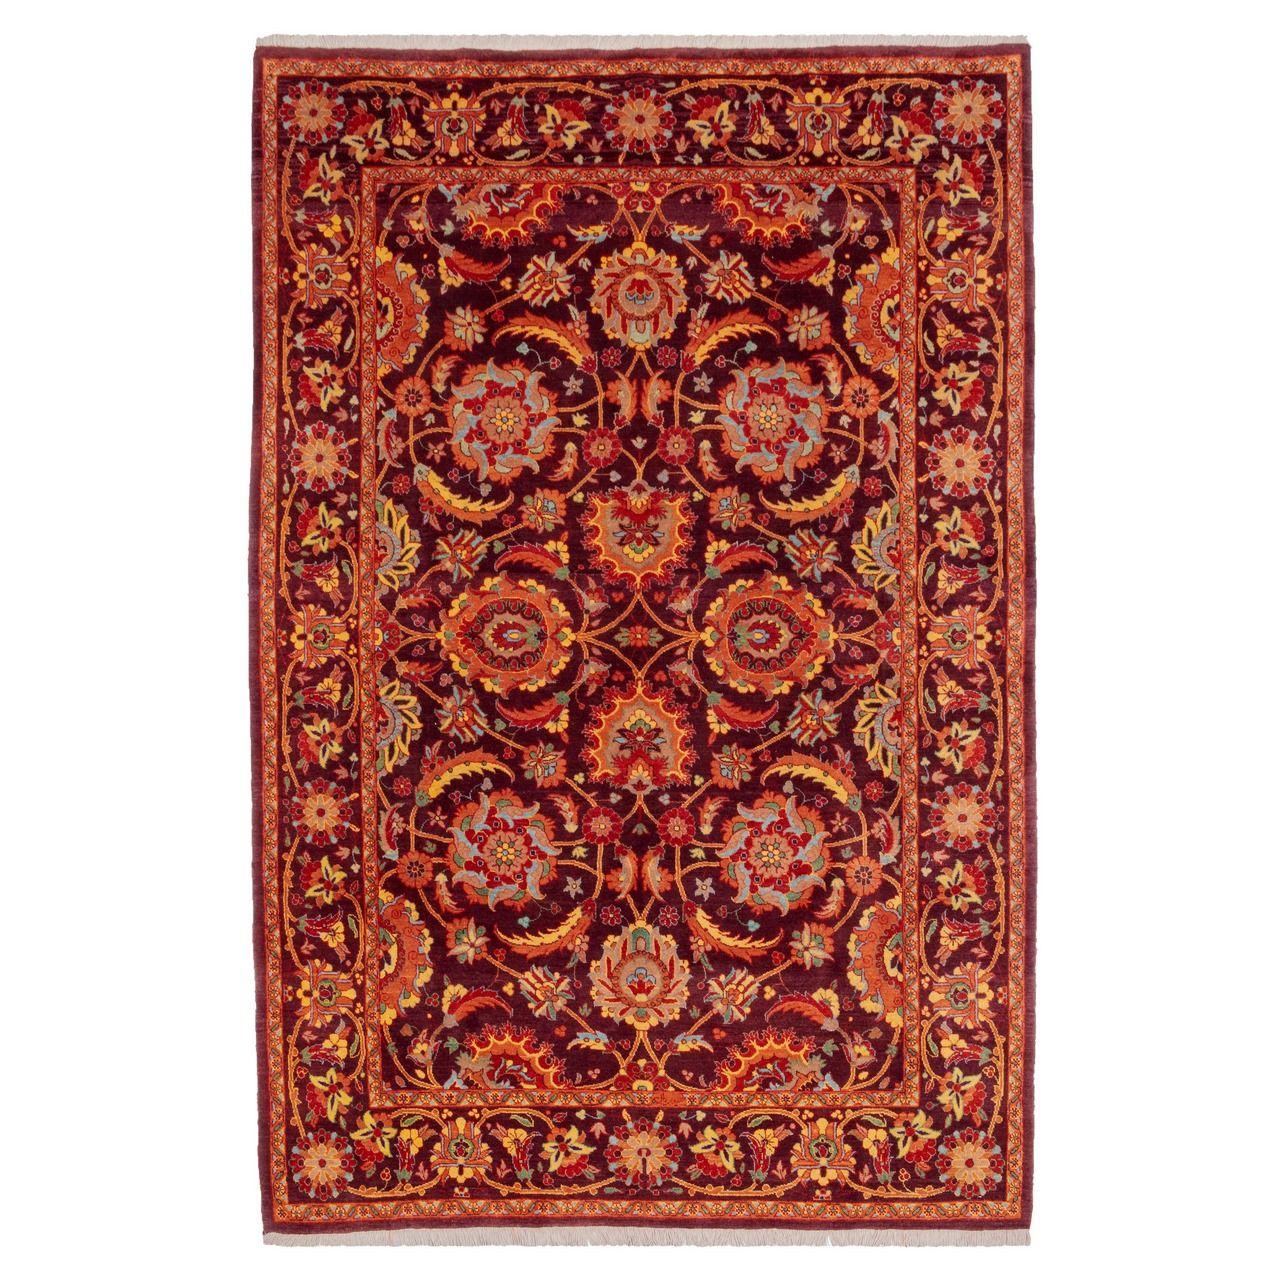 فرش دستباف پنج متری سی پرشیا کد 179211